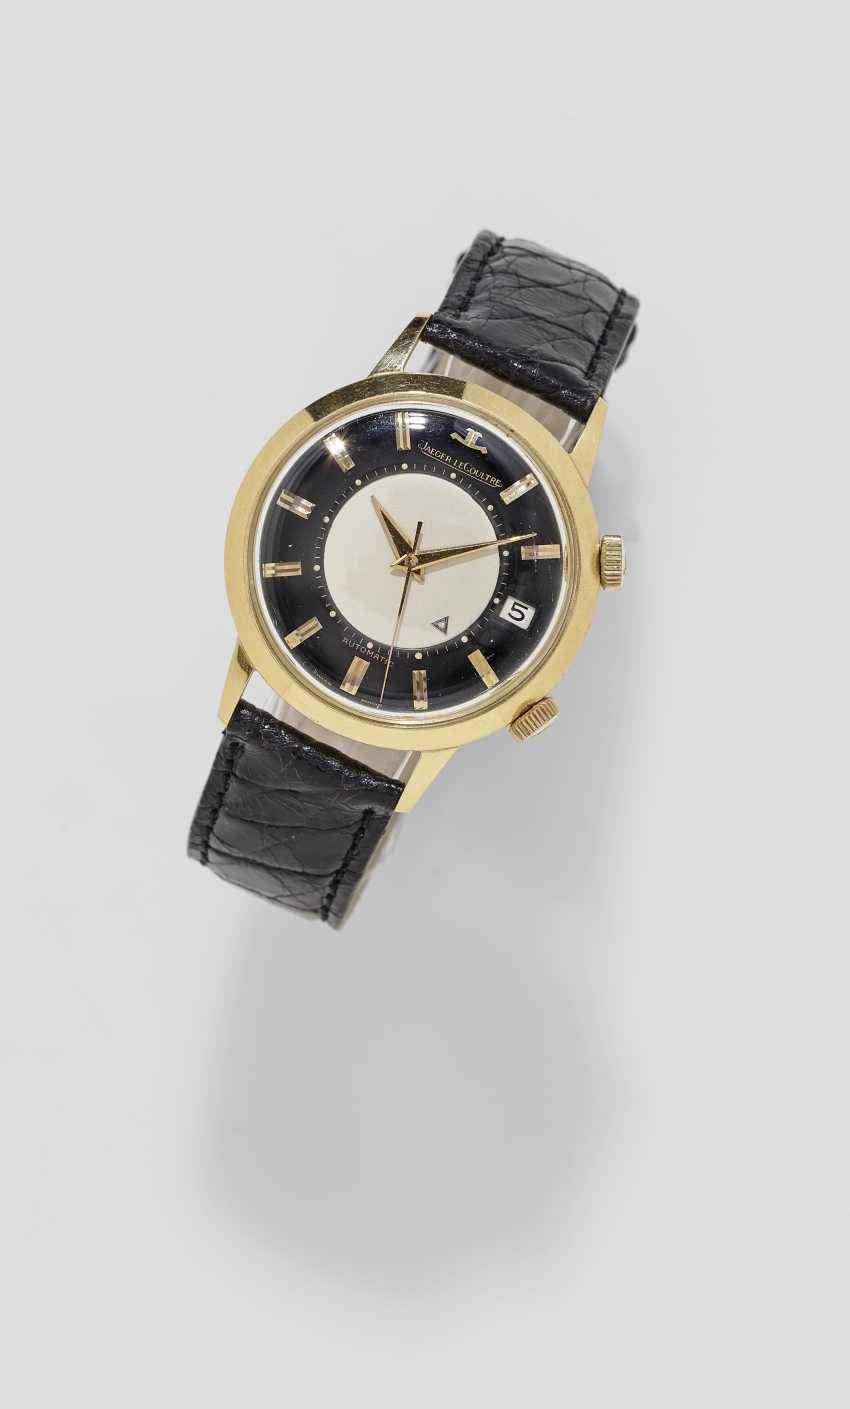 Men's wristwatch with alarm clock. Switzerland, around 1960, JAEGER-LECOULTRE, MEMOVOX, Ref: 855 - photo 1